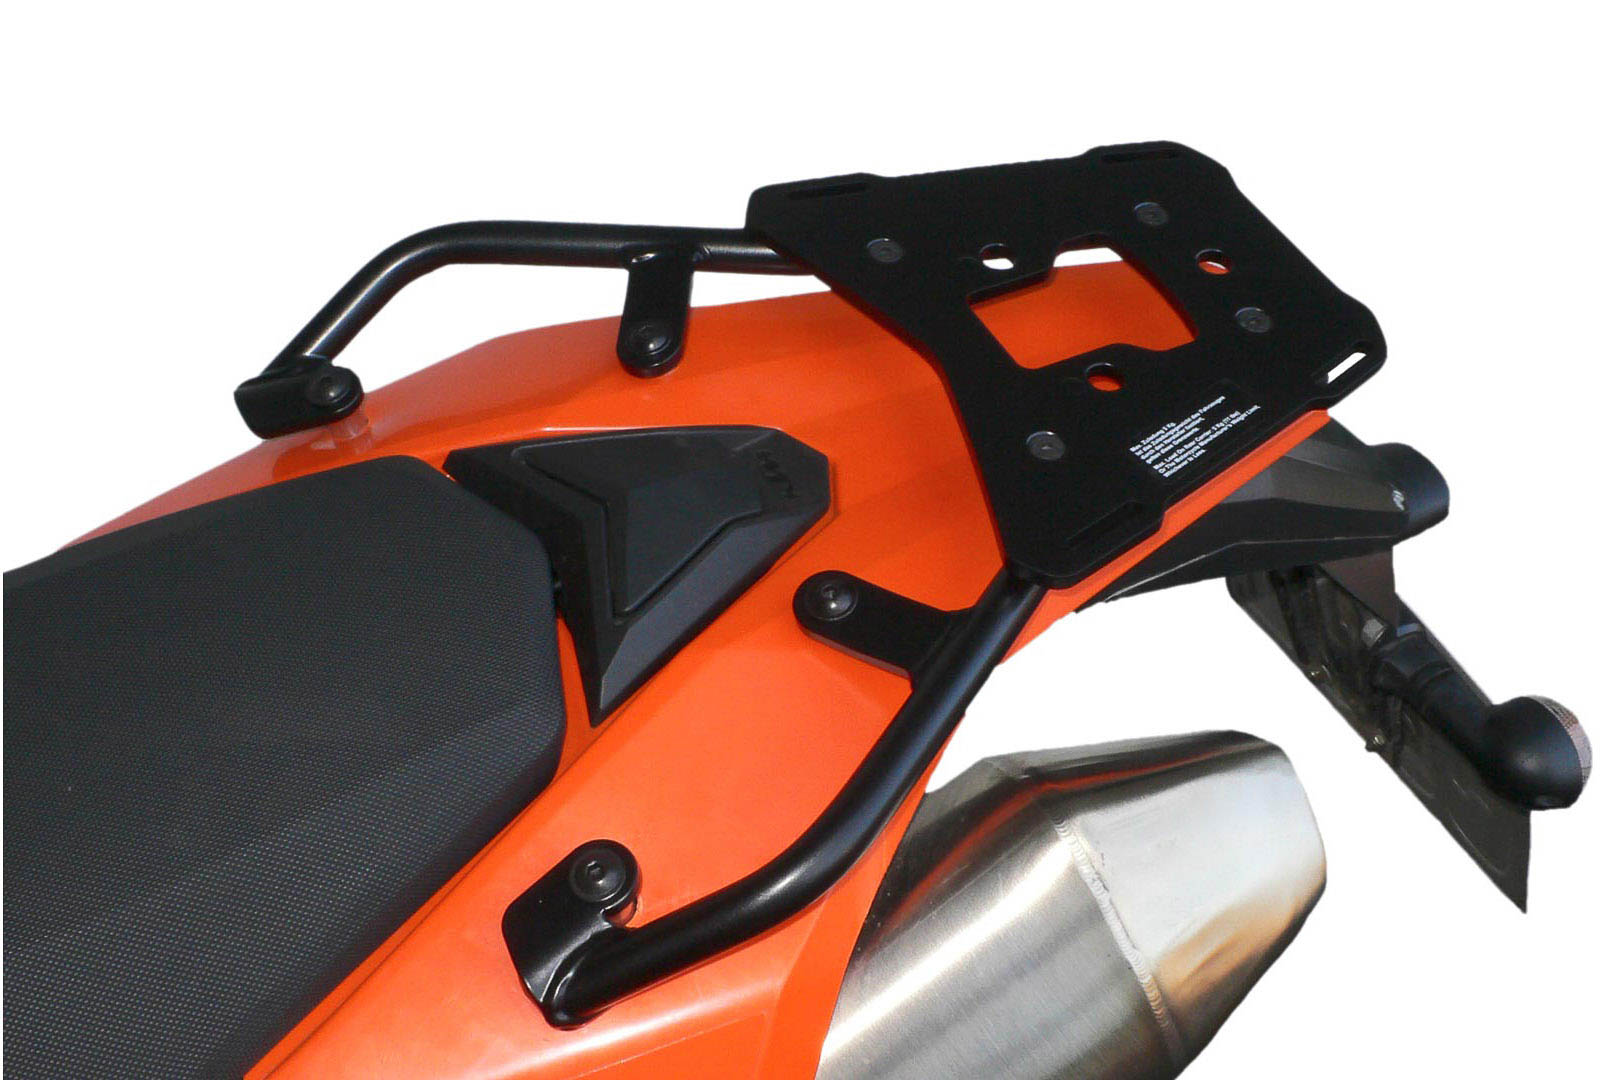 SW-Motech Alu-Rack peräteline KTM LC4 690 Enduro musta